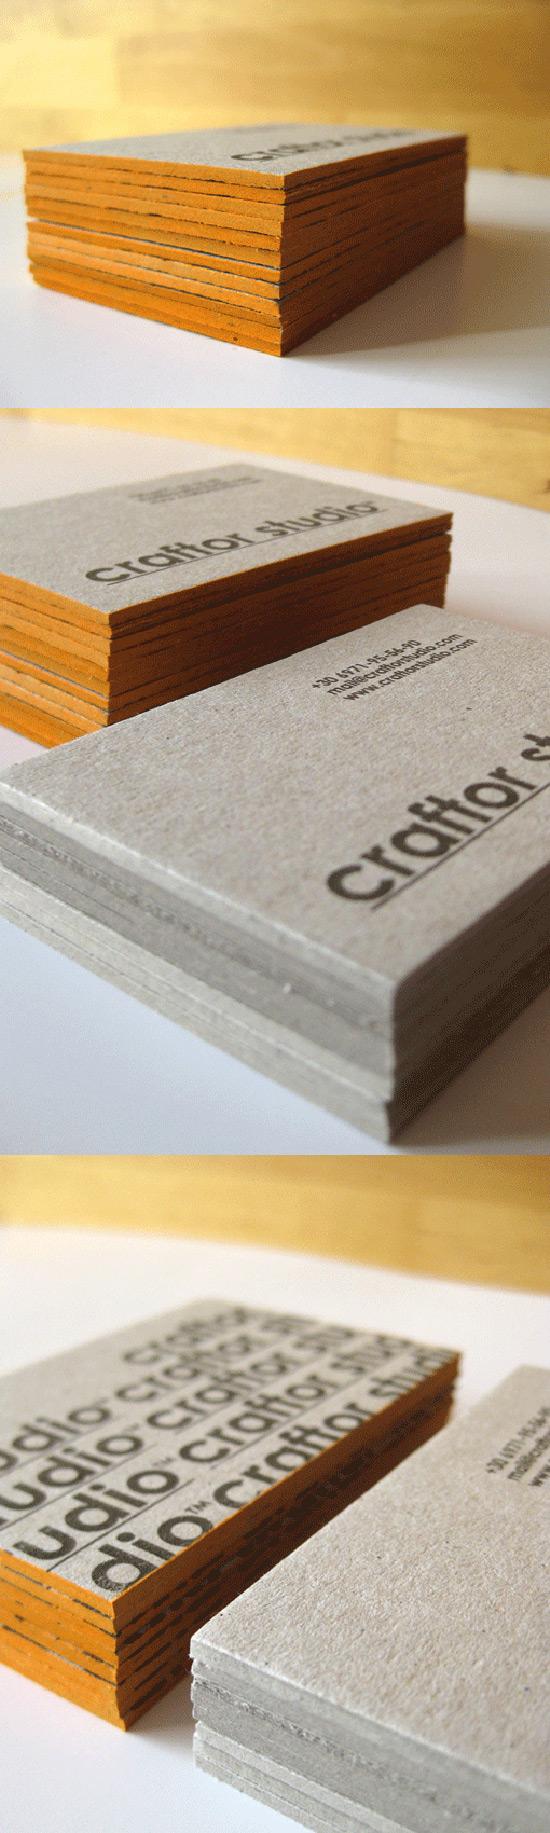 business-card-design-12dec-48